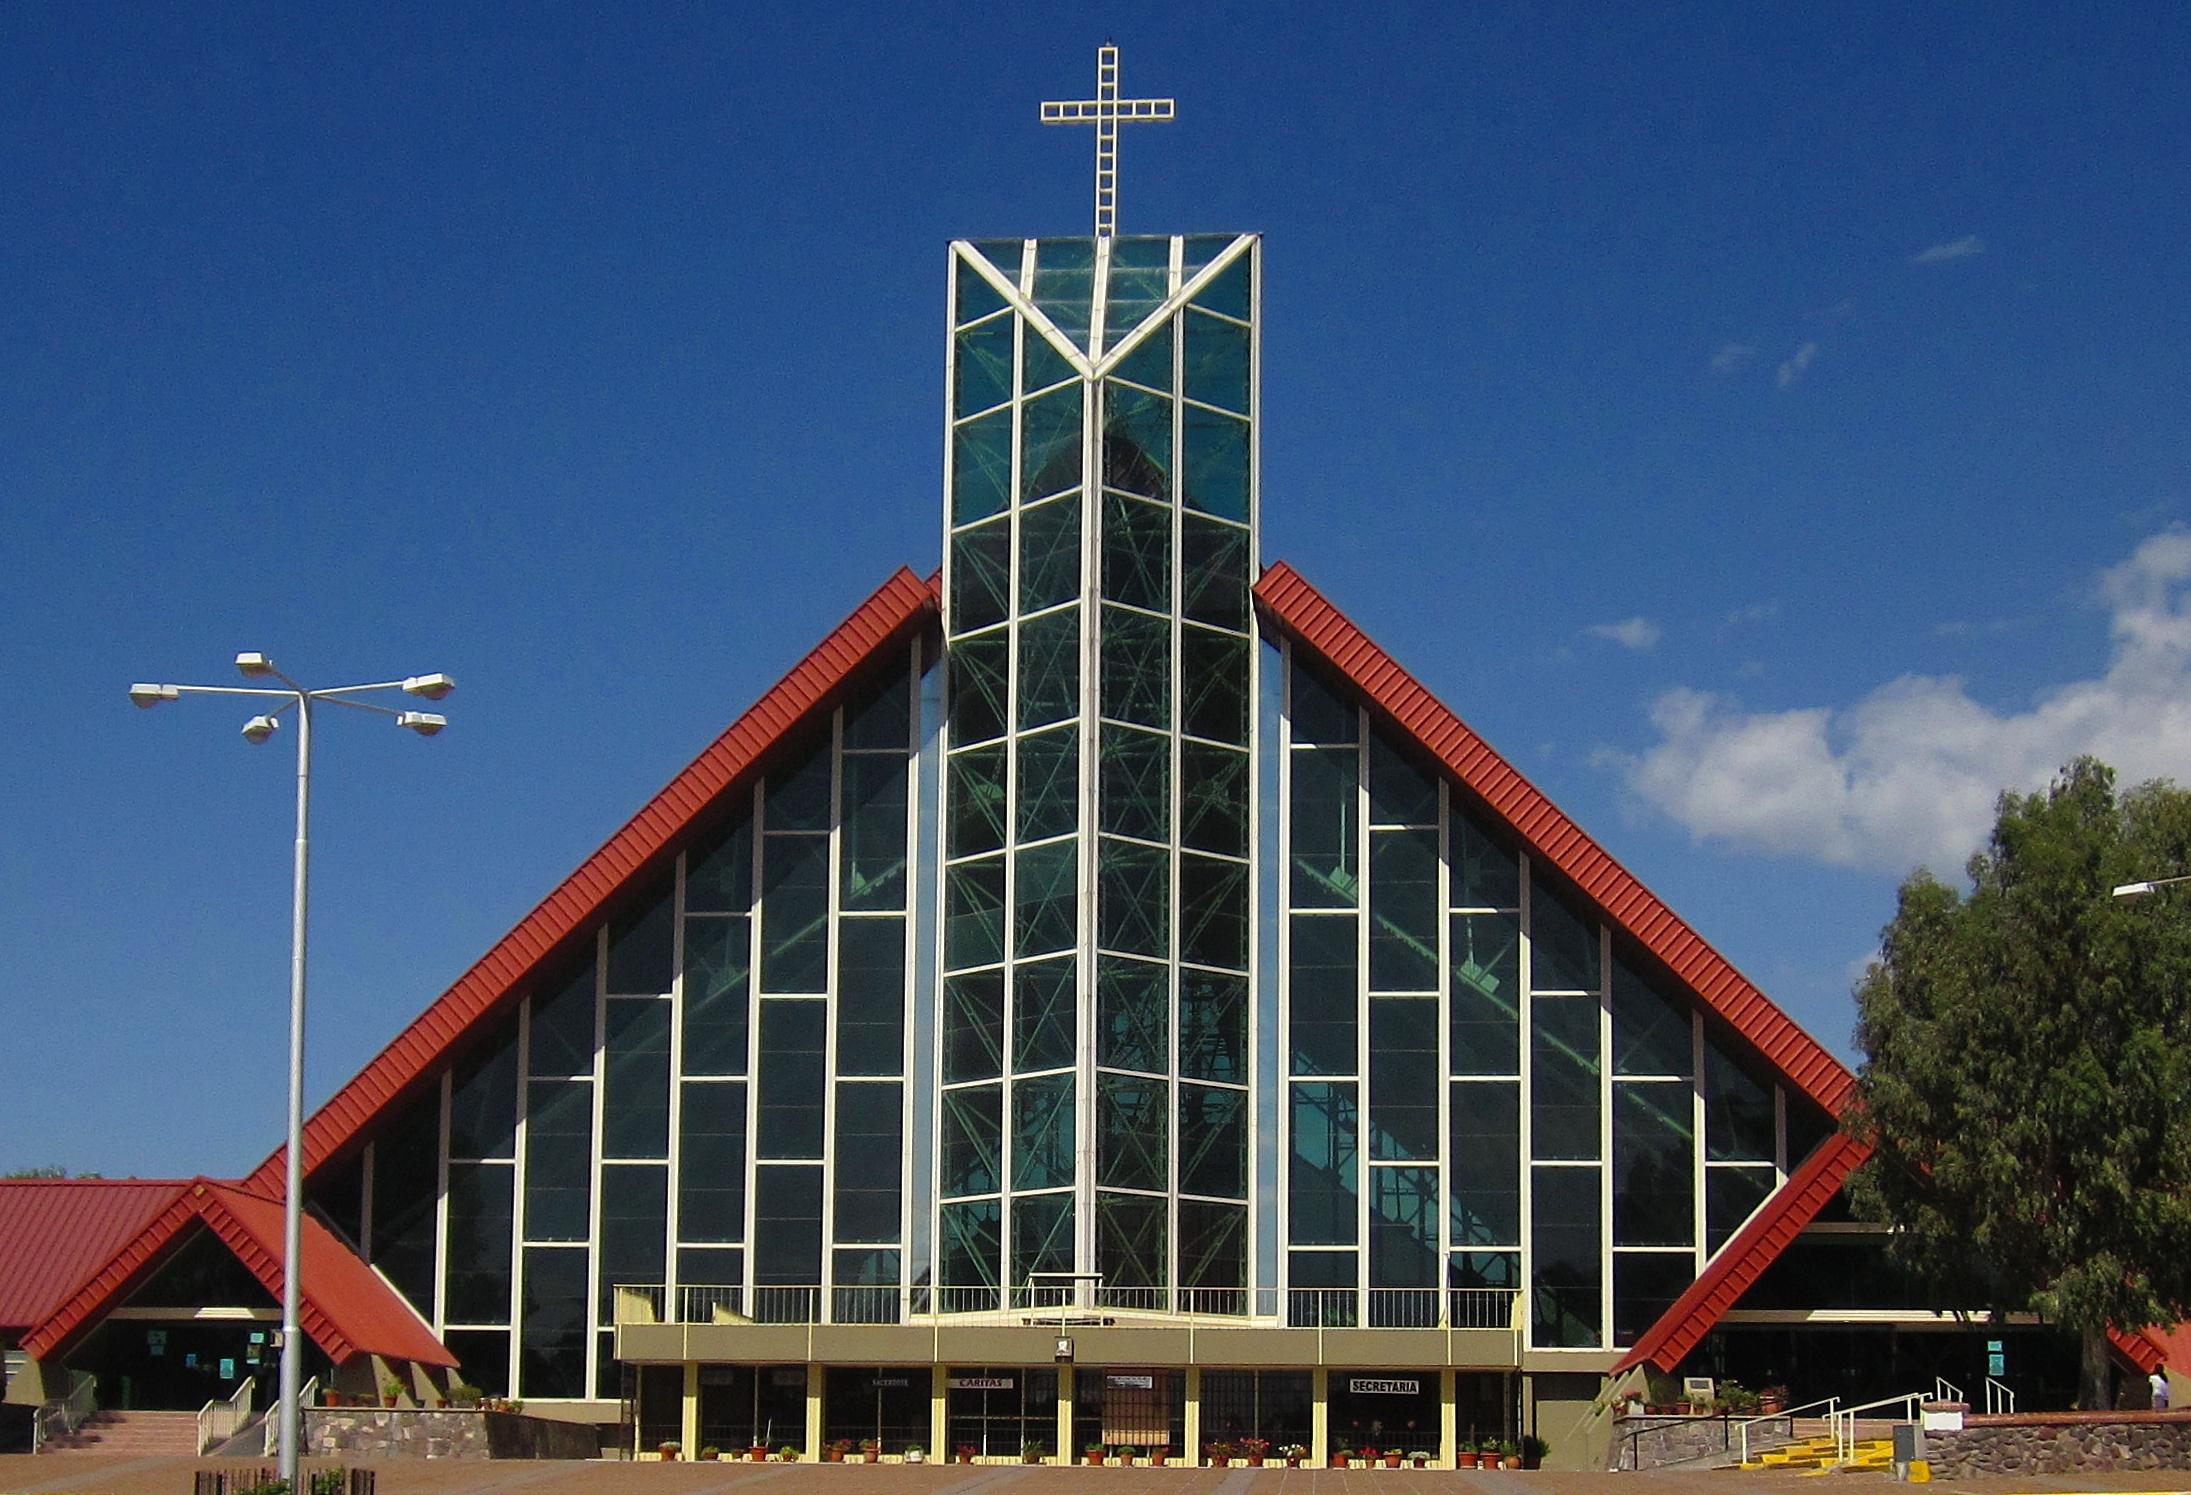 Nuestra Señora De Lourdes: File:Iglesia De Cristal Nuestra Señora De Lourdes De El